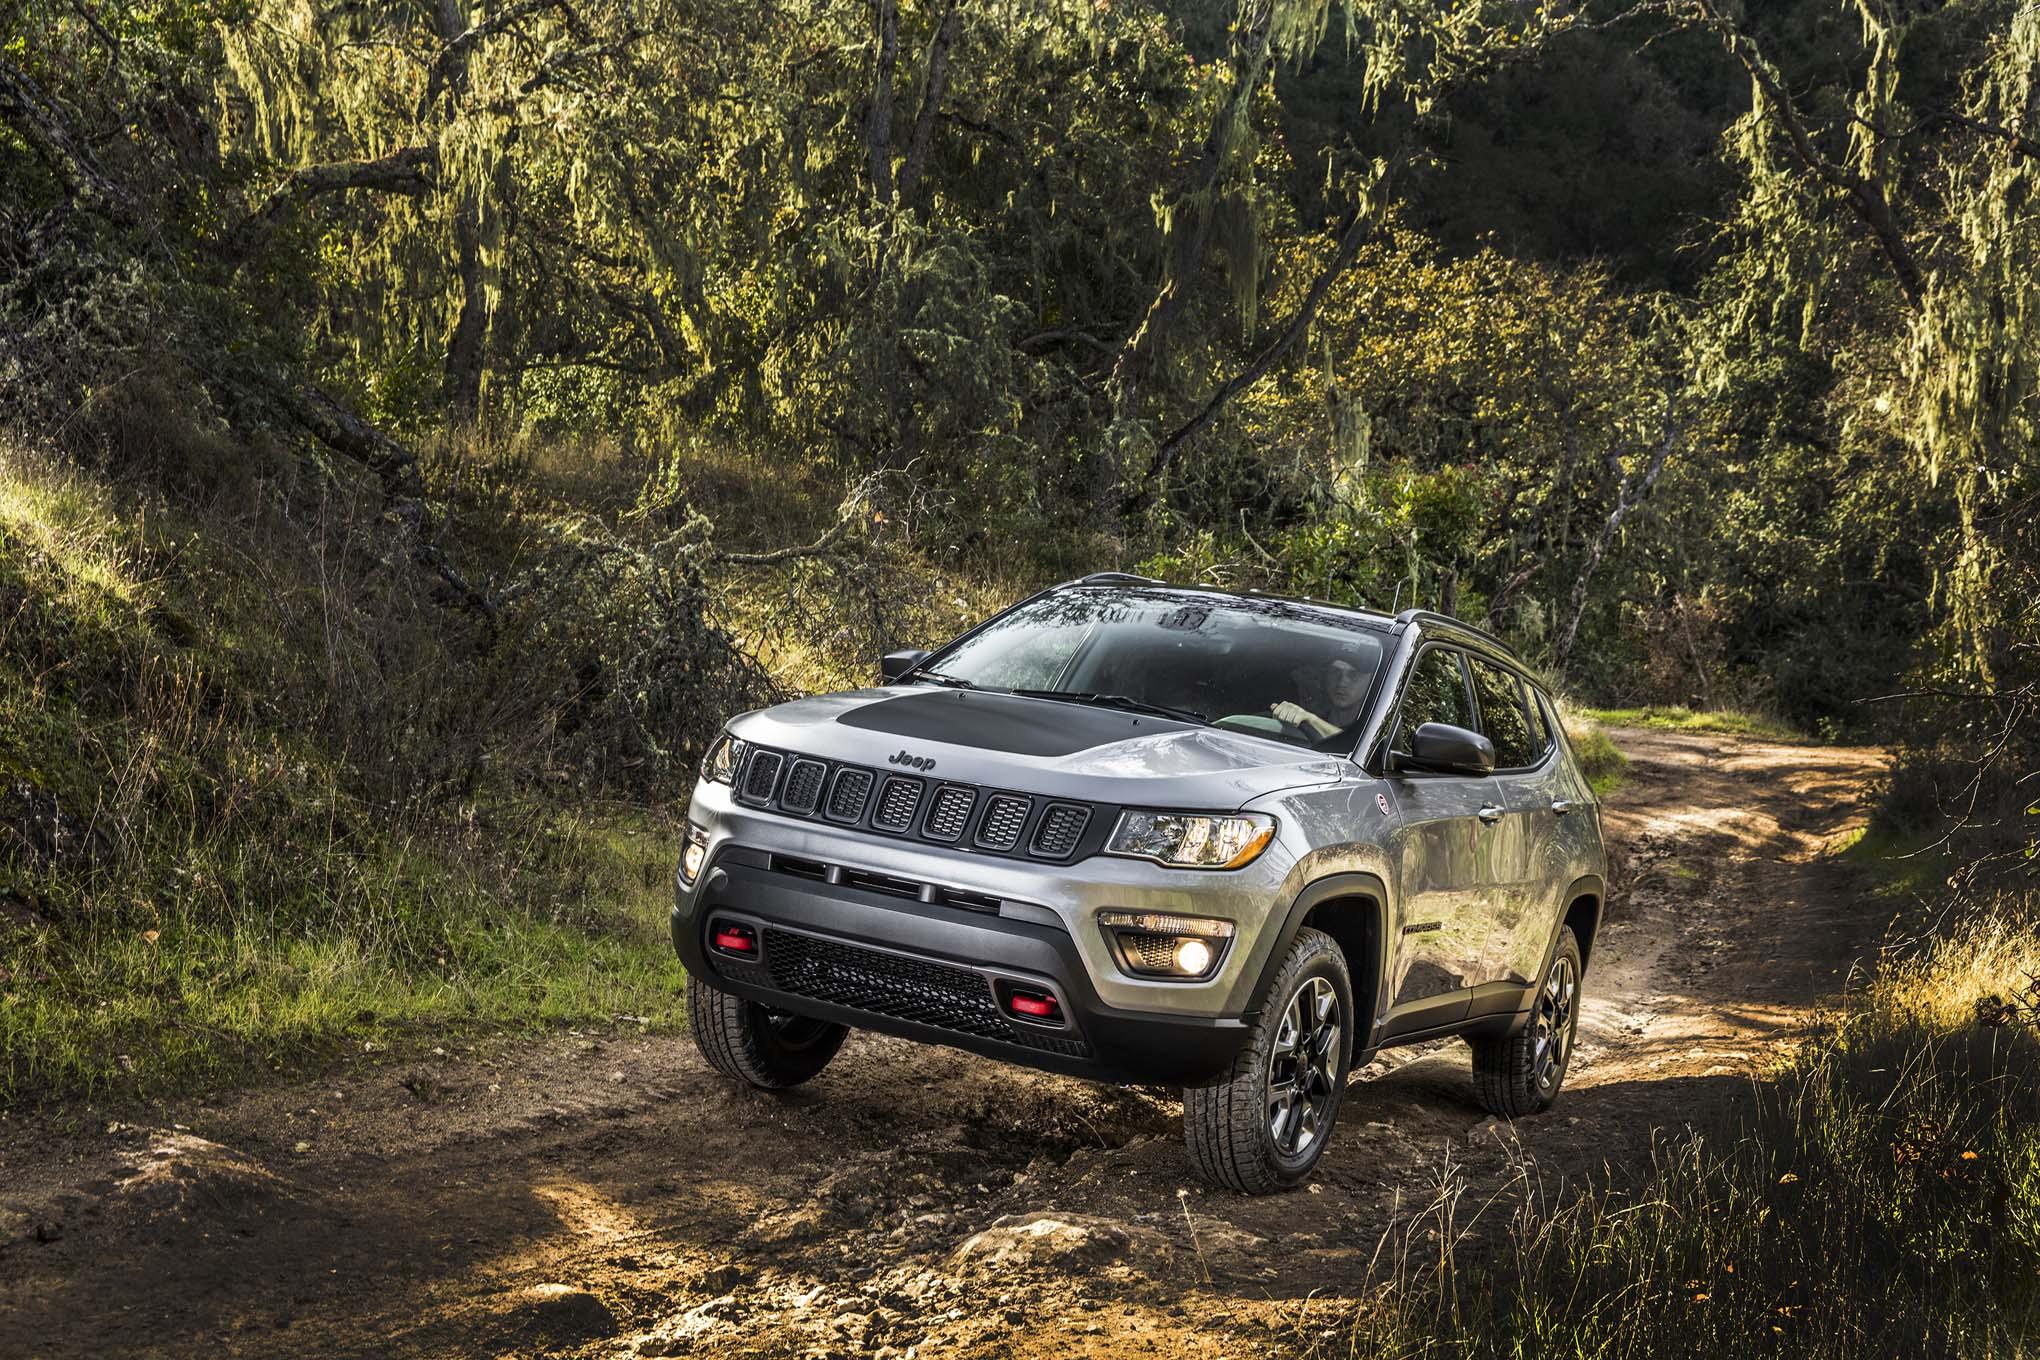 2017 Jeep Compass Trailhawk Front Three Quarter 02